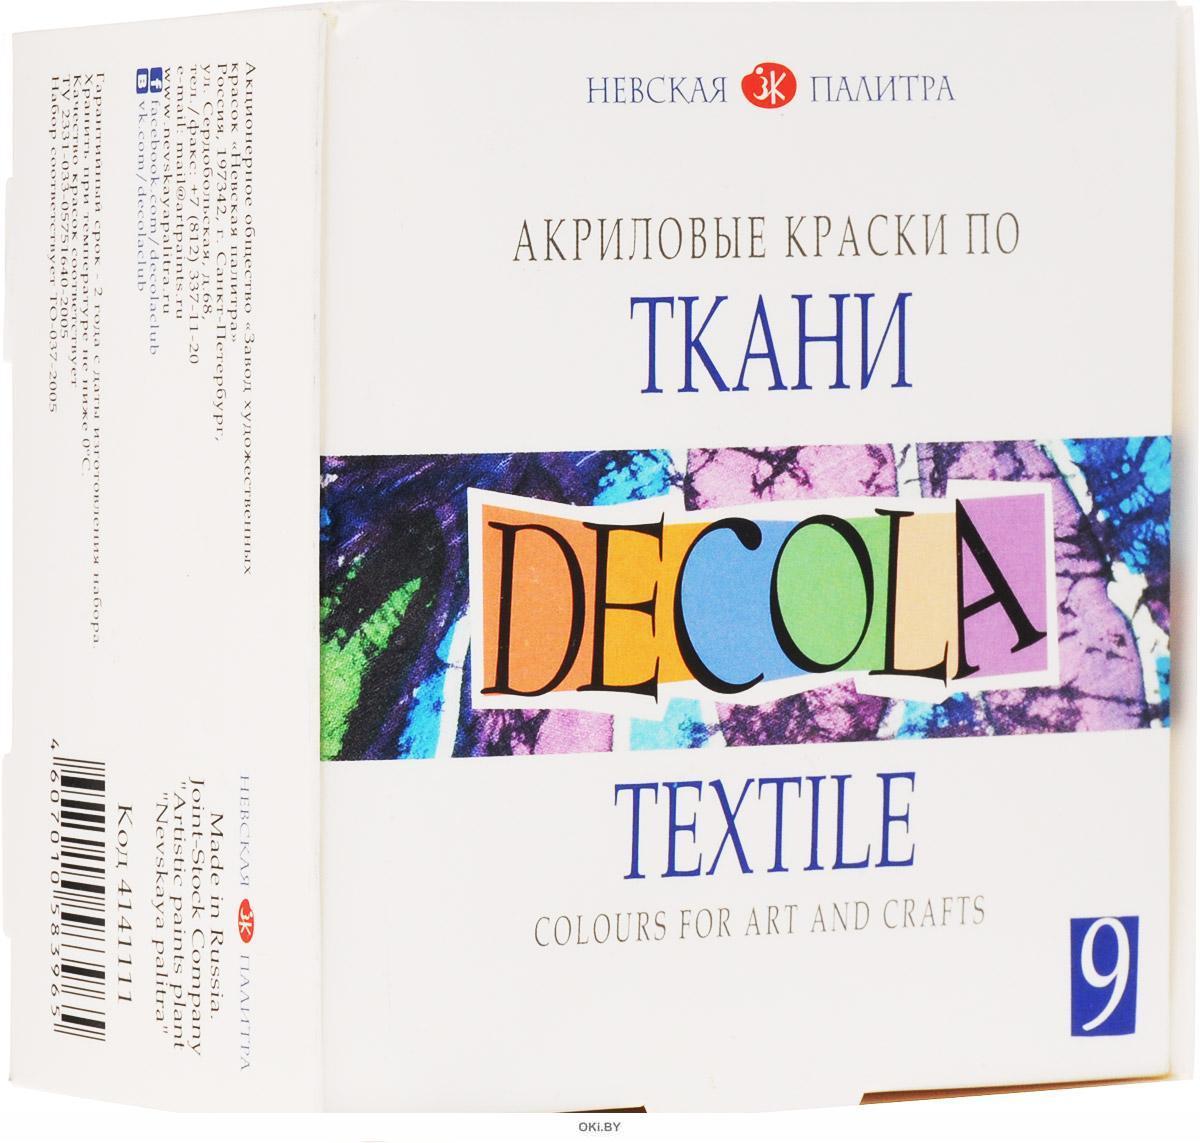 Акриловые краски по ткани 9 цветов по 20 мл Decola